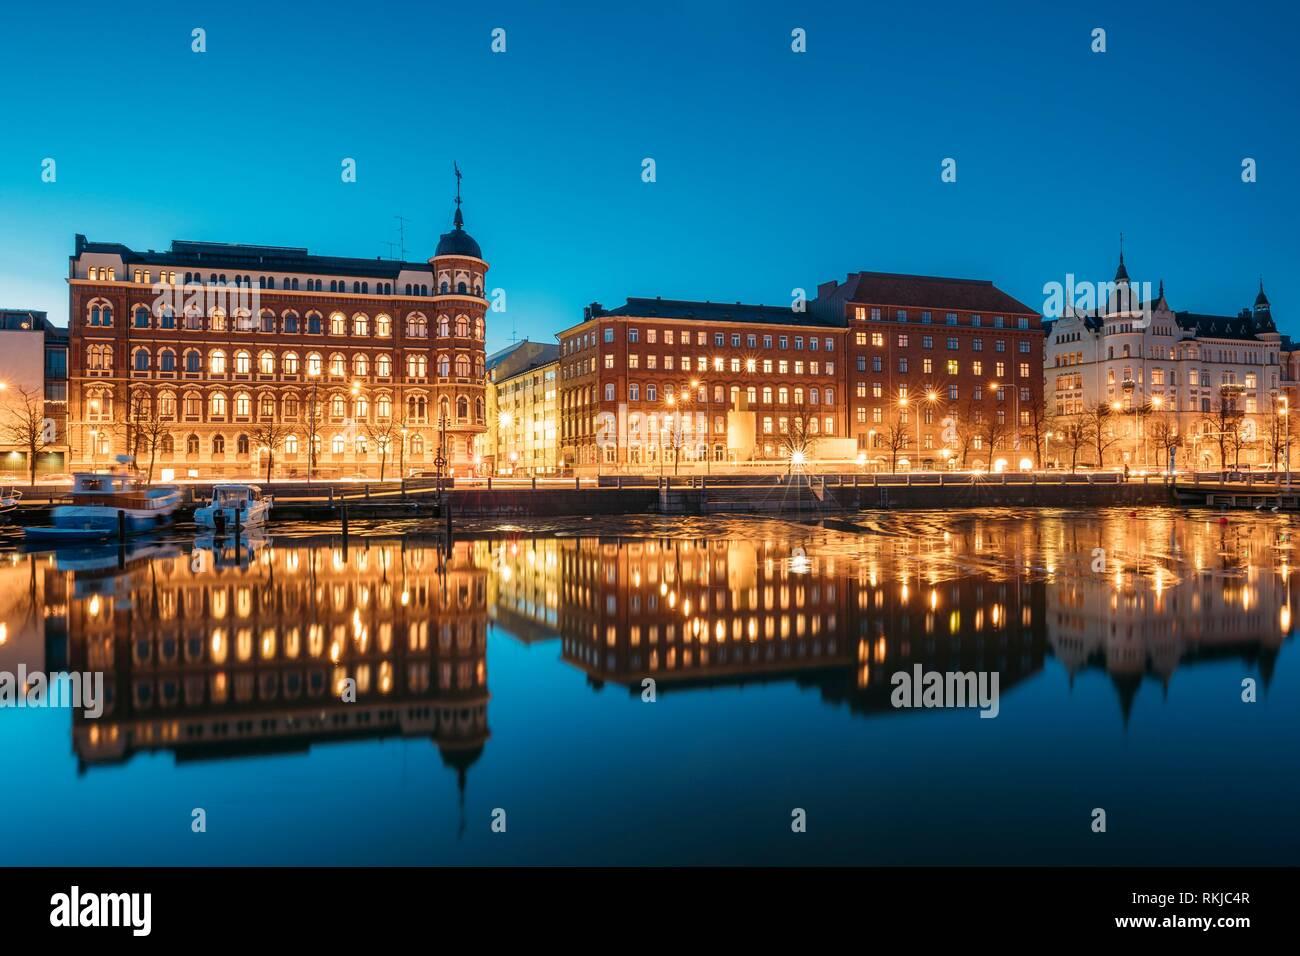 Helsinki, Finland. View Of Pohjoisranta Street In Evening Or Night Illumination. - Stock Image